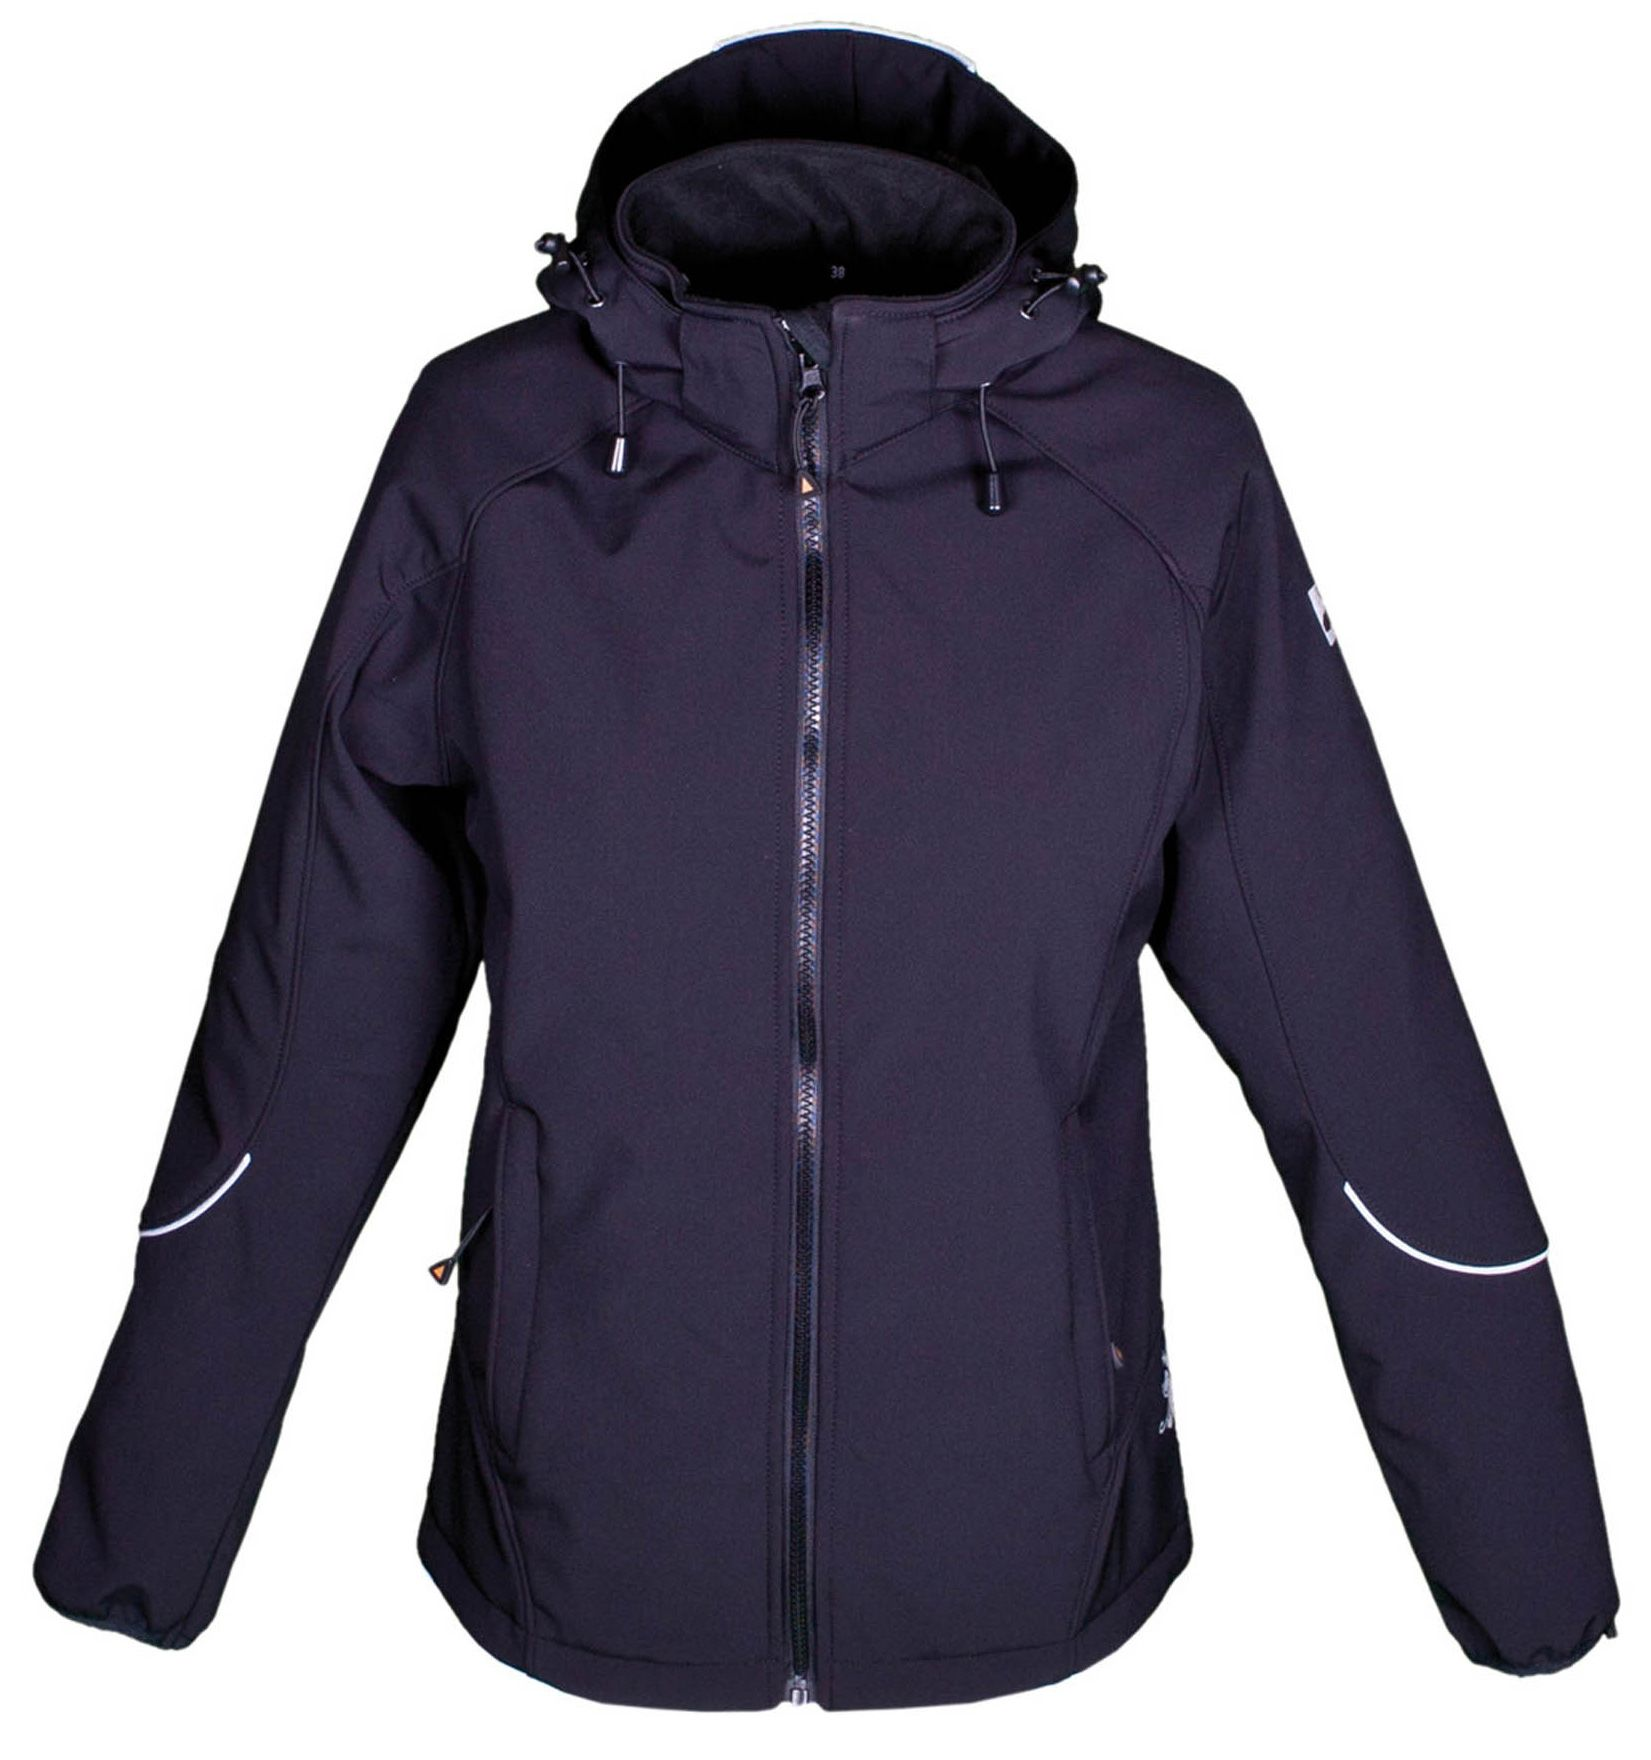 Softshell Jacke Damen Große Größen